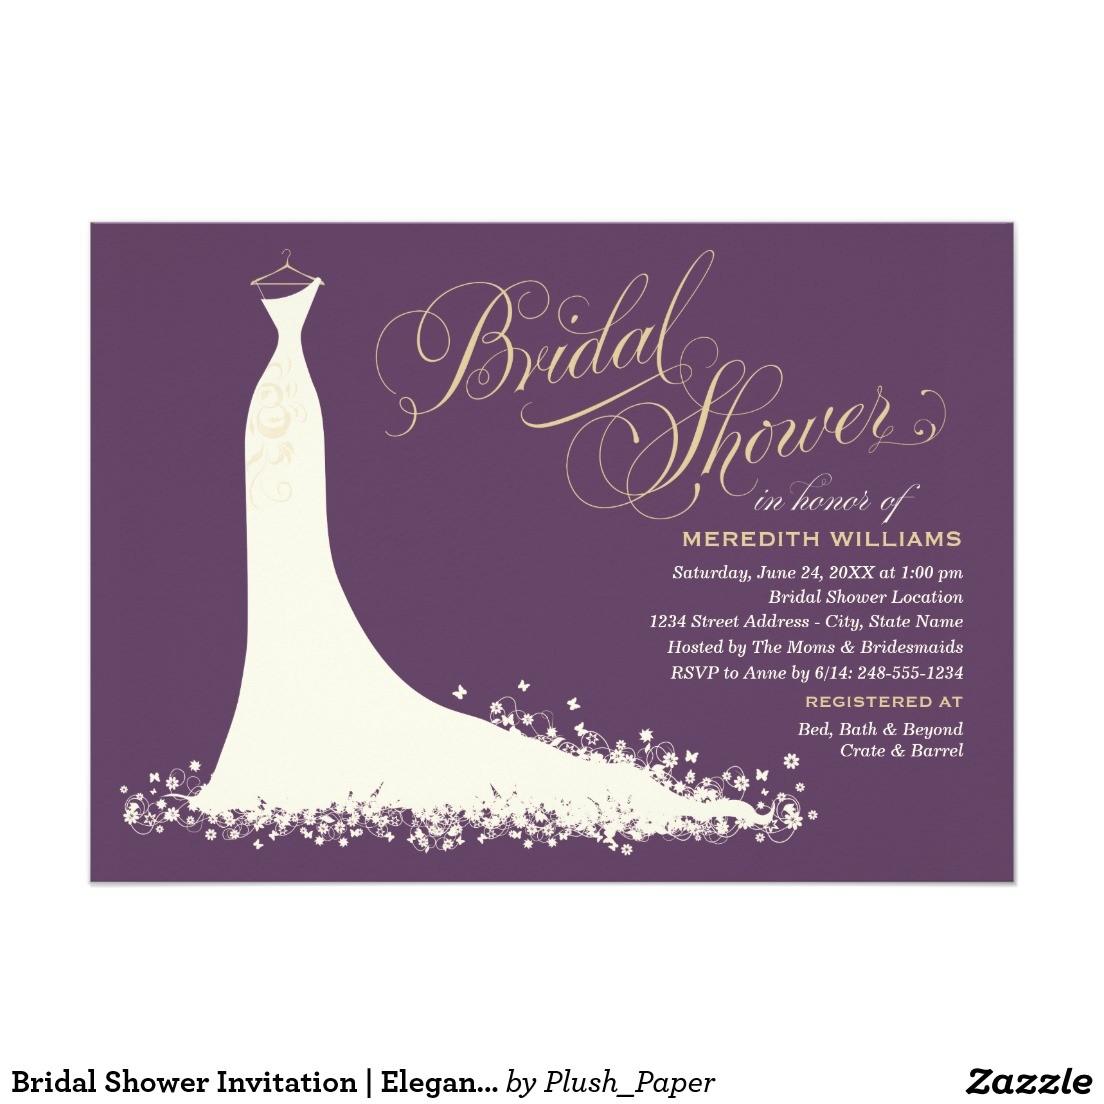 vistaprint bridal shower invites